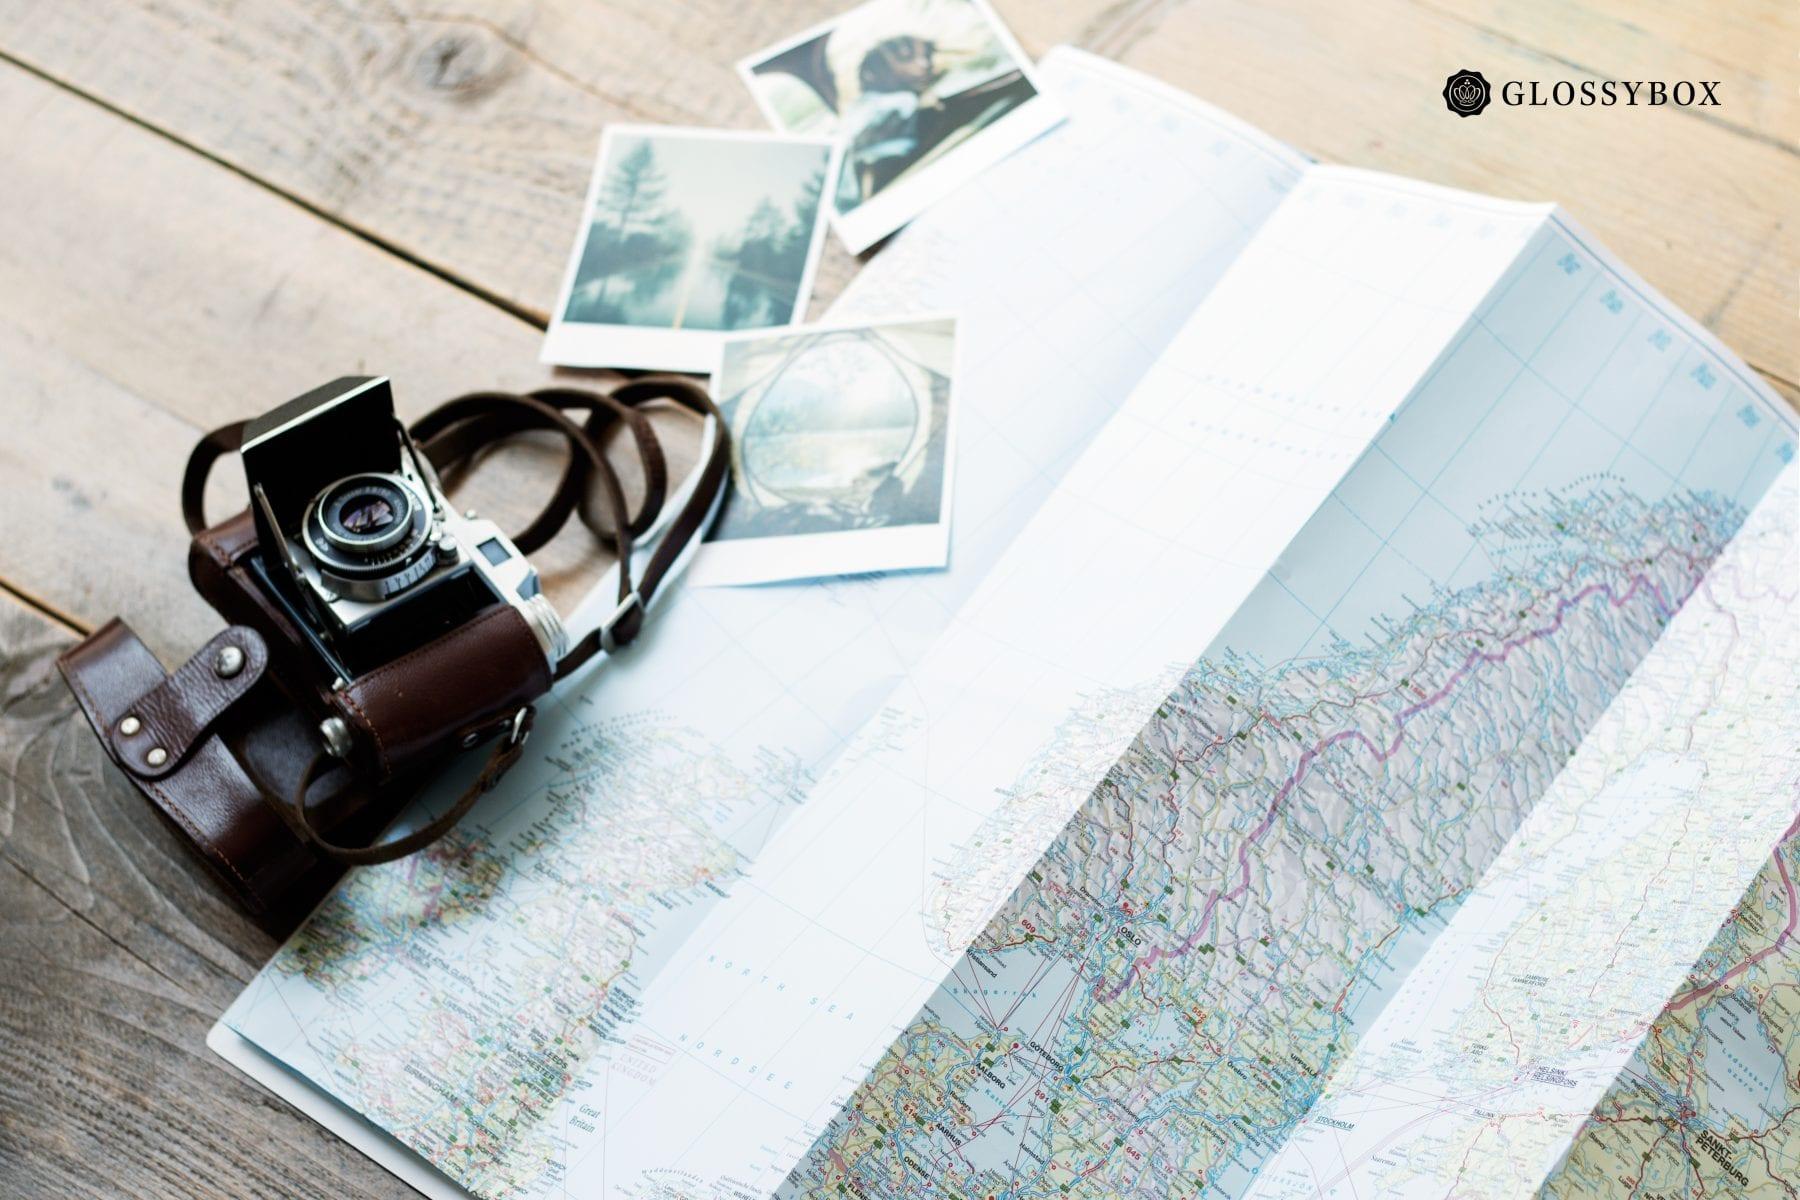 Let's get lost: Deine GLOSSY Wallpaper im September